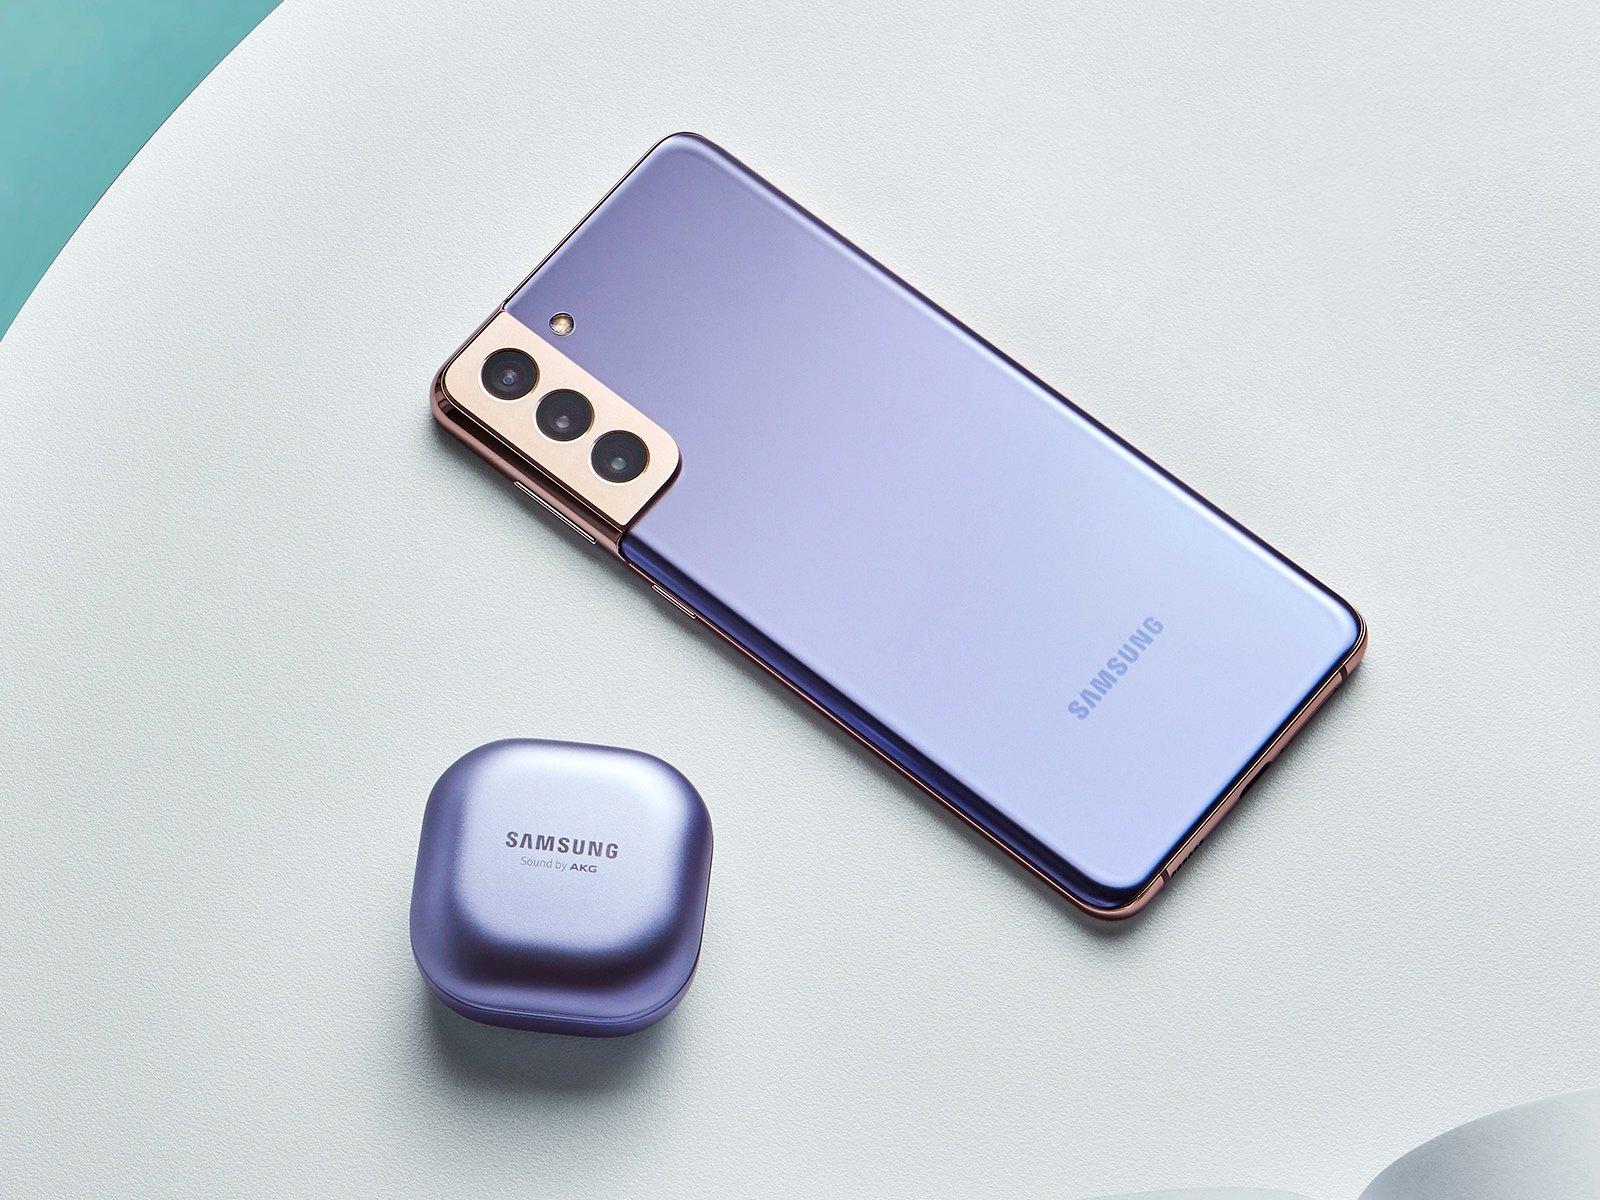 Samsung Galaxy S21 Buds Pro